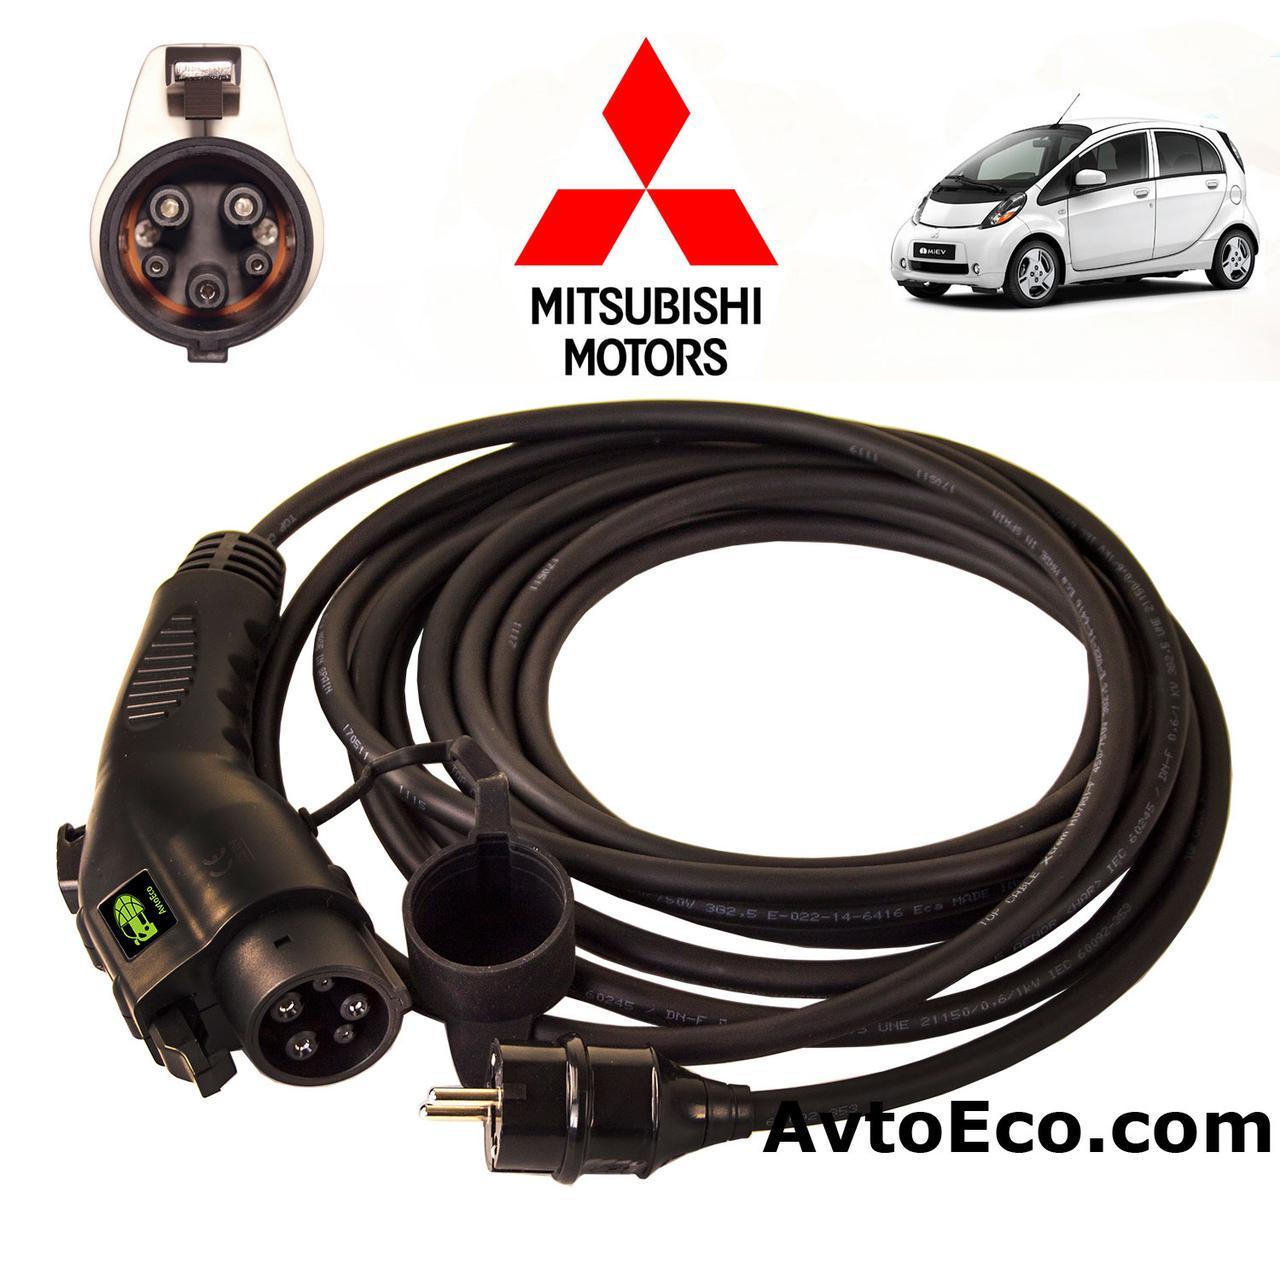 Зарядное устройство для электромобиля Mitsubishi i-MiEV AutoEco J1772-16A